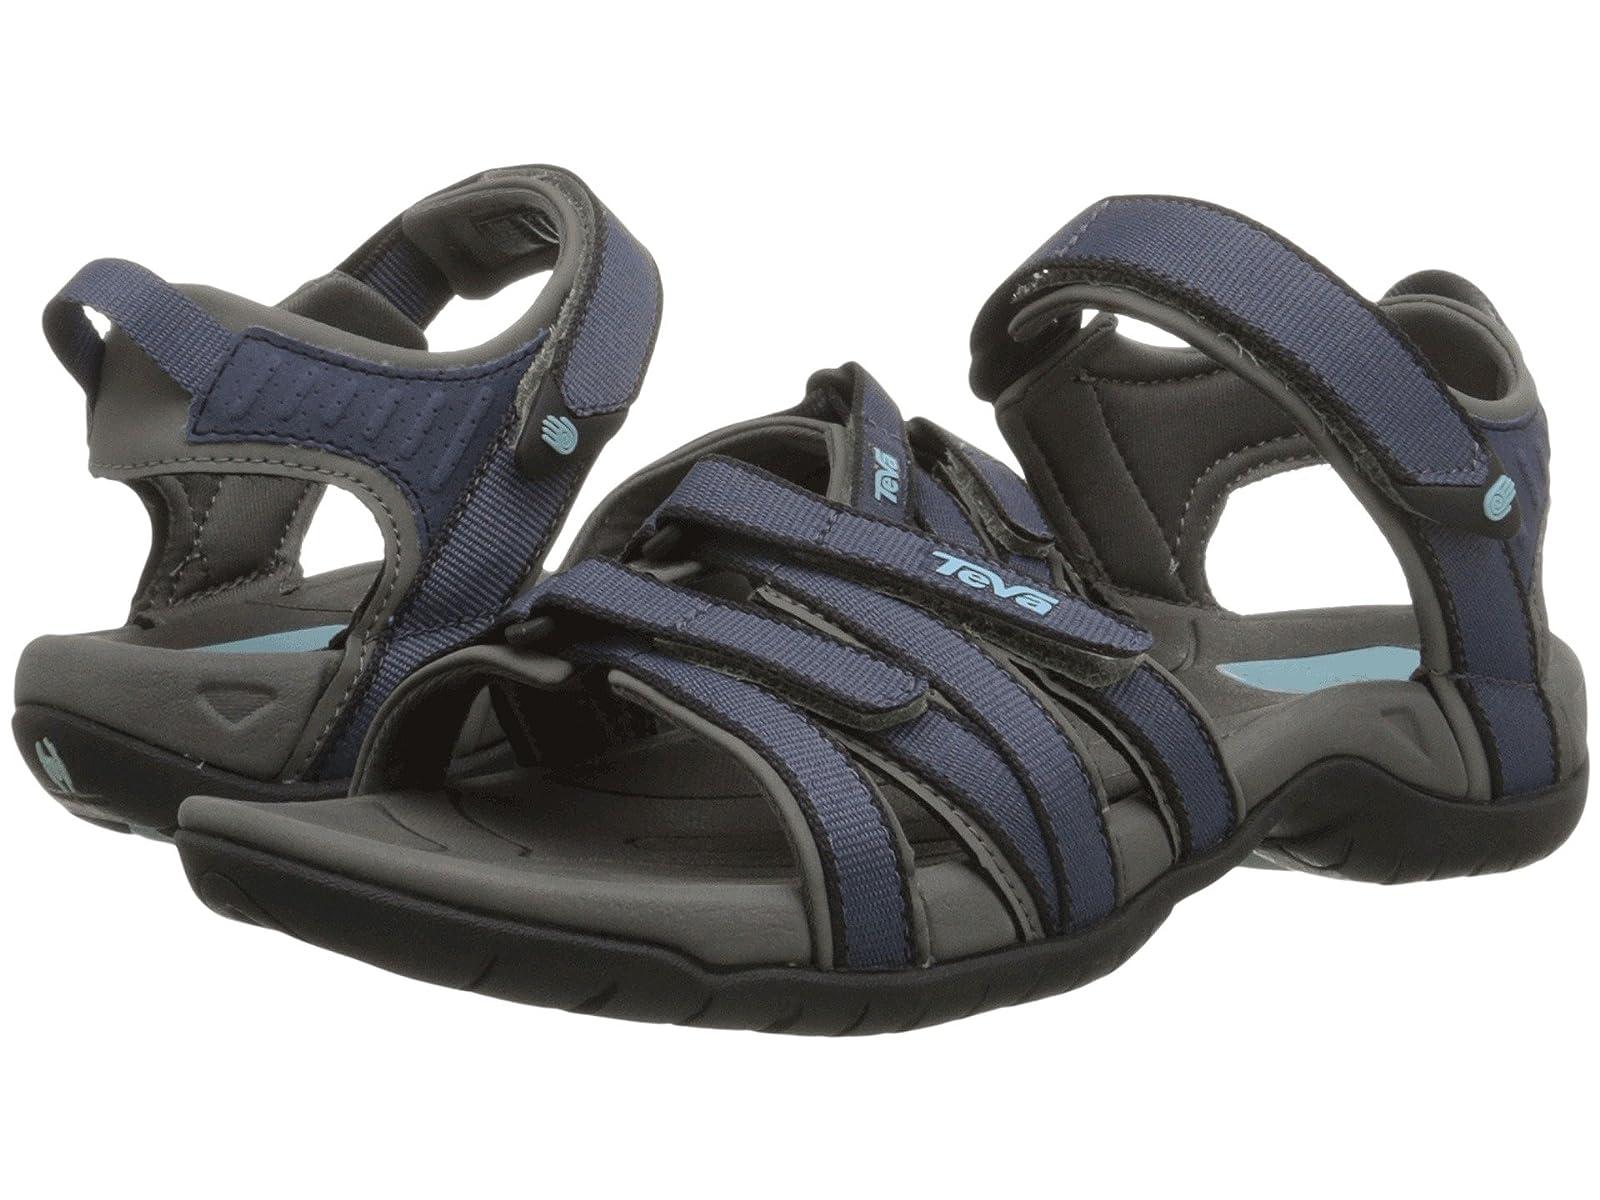 Teva TirraAtmospheric grades have affordable shoes